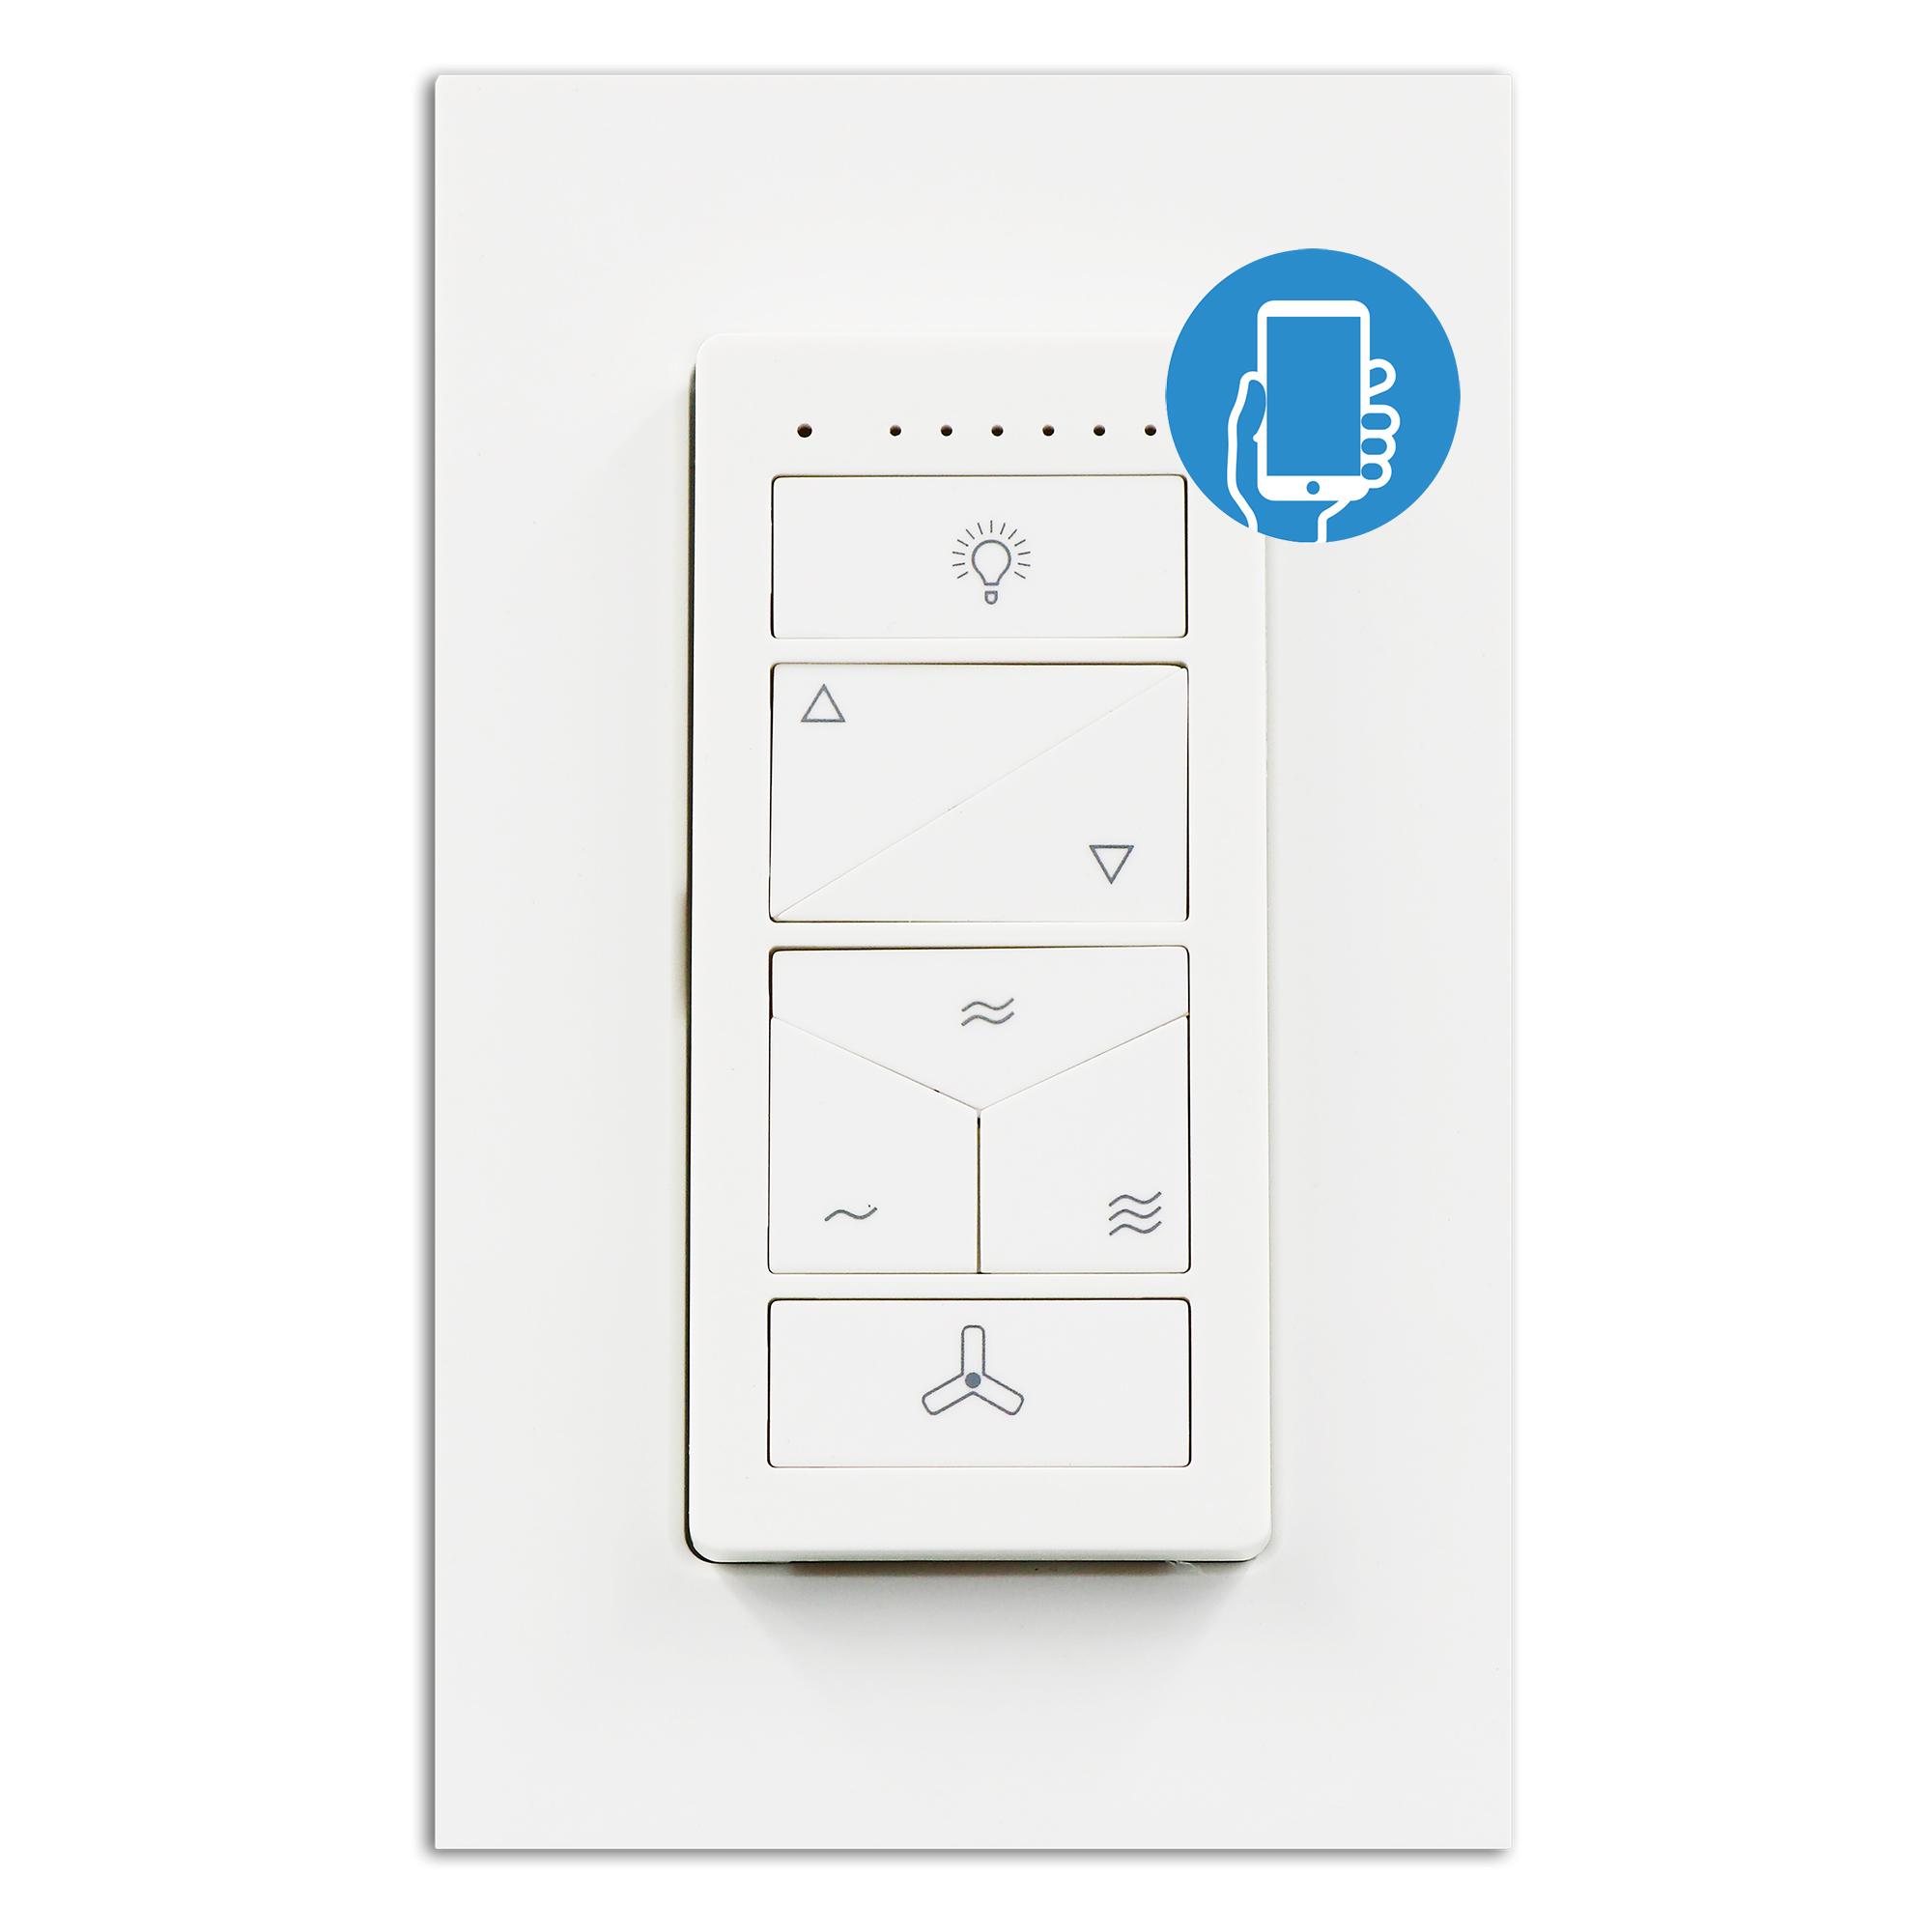 Mi Smart Remote Control by ThreeSixty Fans